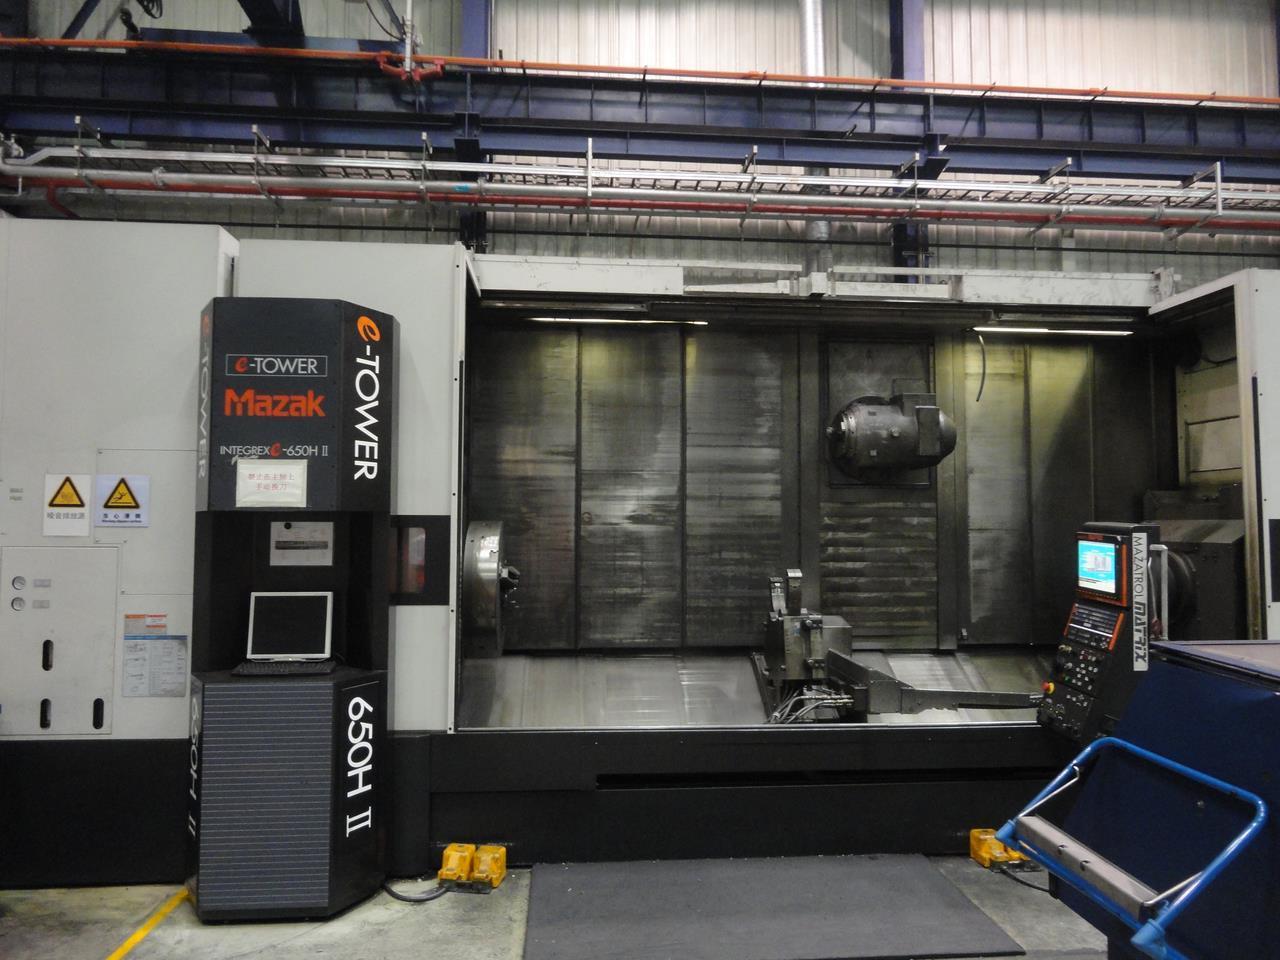 Dreh- u  Fräszentrum - MAZAK INTEGREX E-650H-S MAZATROL Matrix